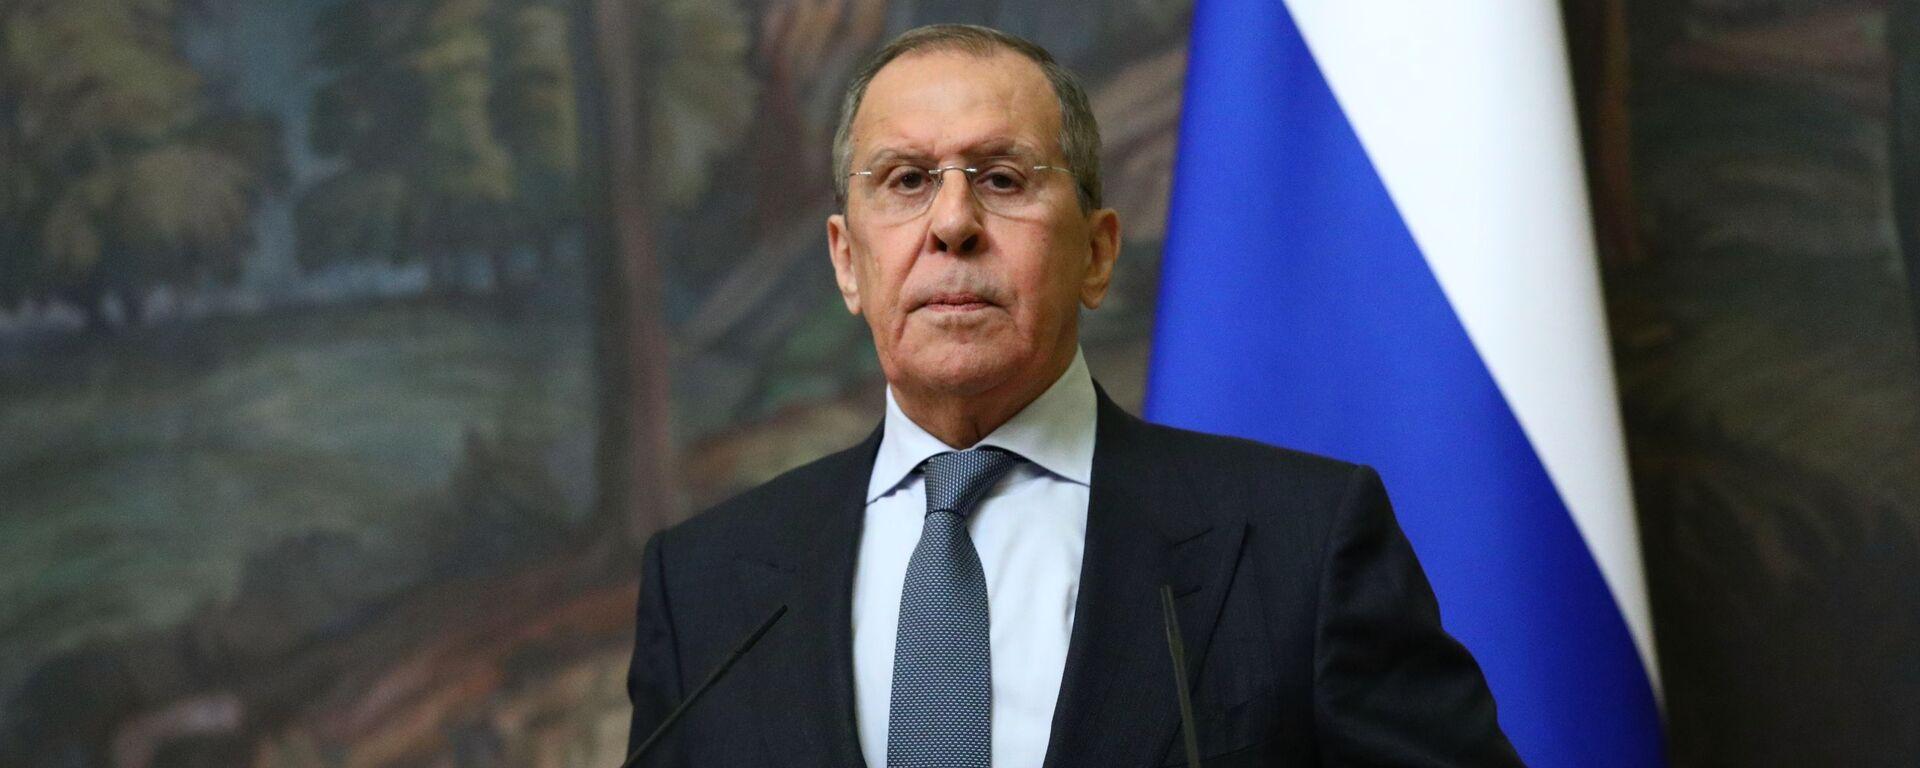 El ministro de Relaciones Exteriores de Rusia Sergéi Lavrov - Sputnik Mundo, 1920, 28.04.2021